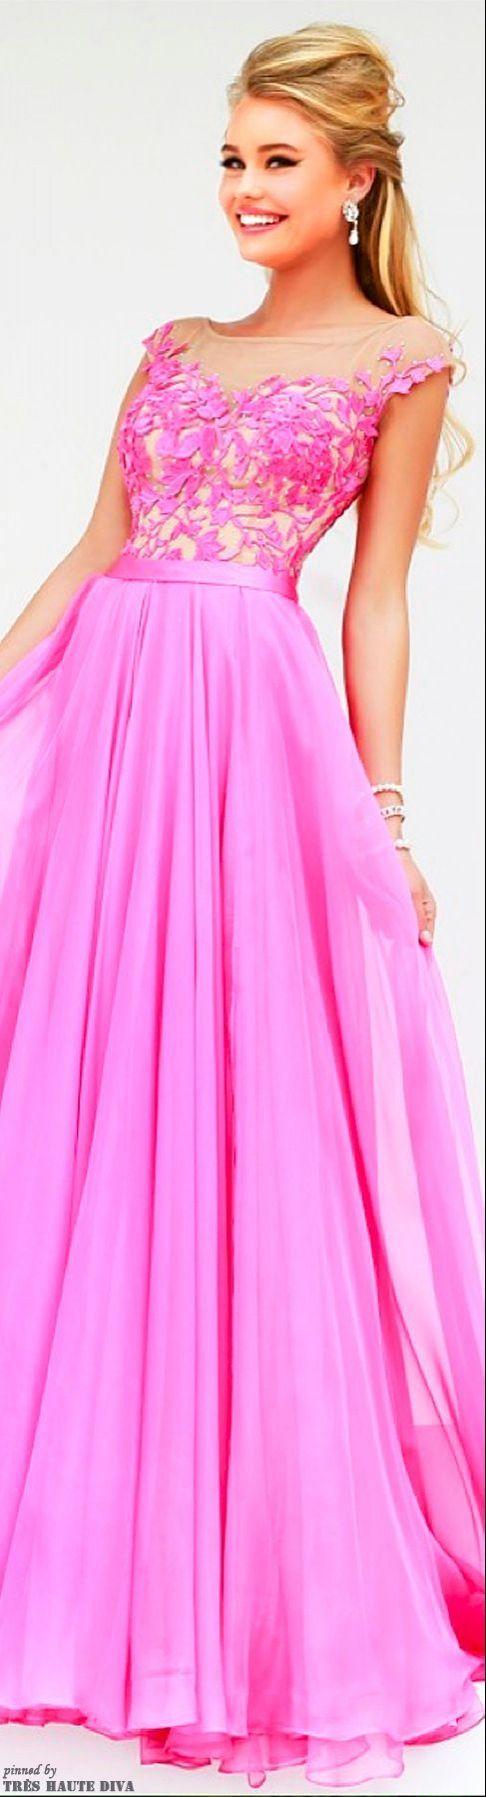 Sherri Hill Spring 2015 prom dress prom dresses | Clothes. <3 ...